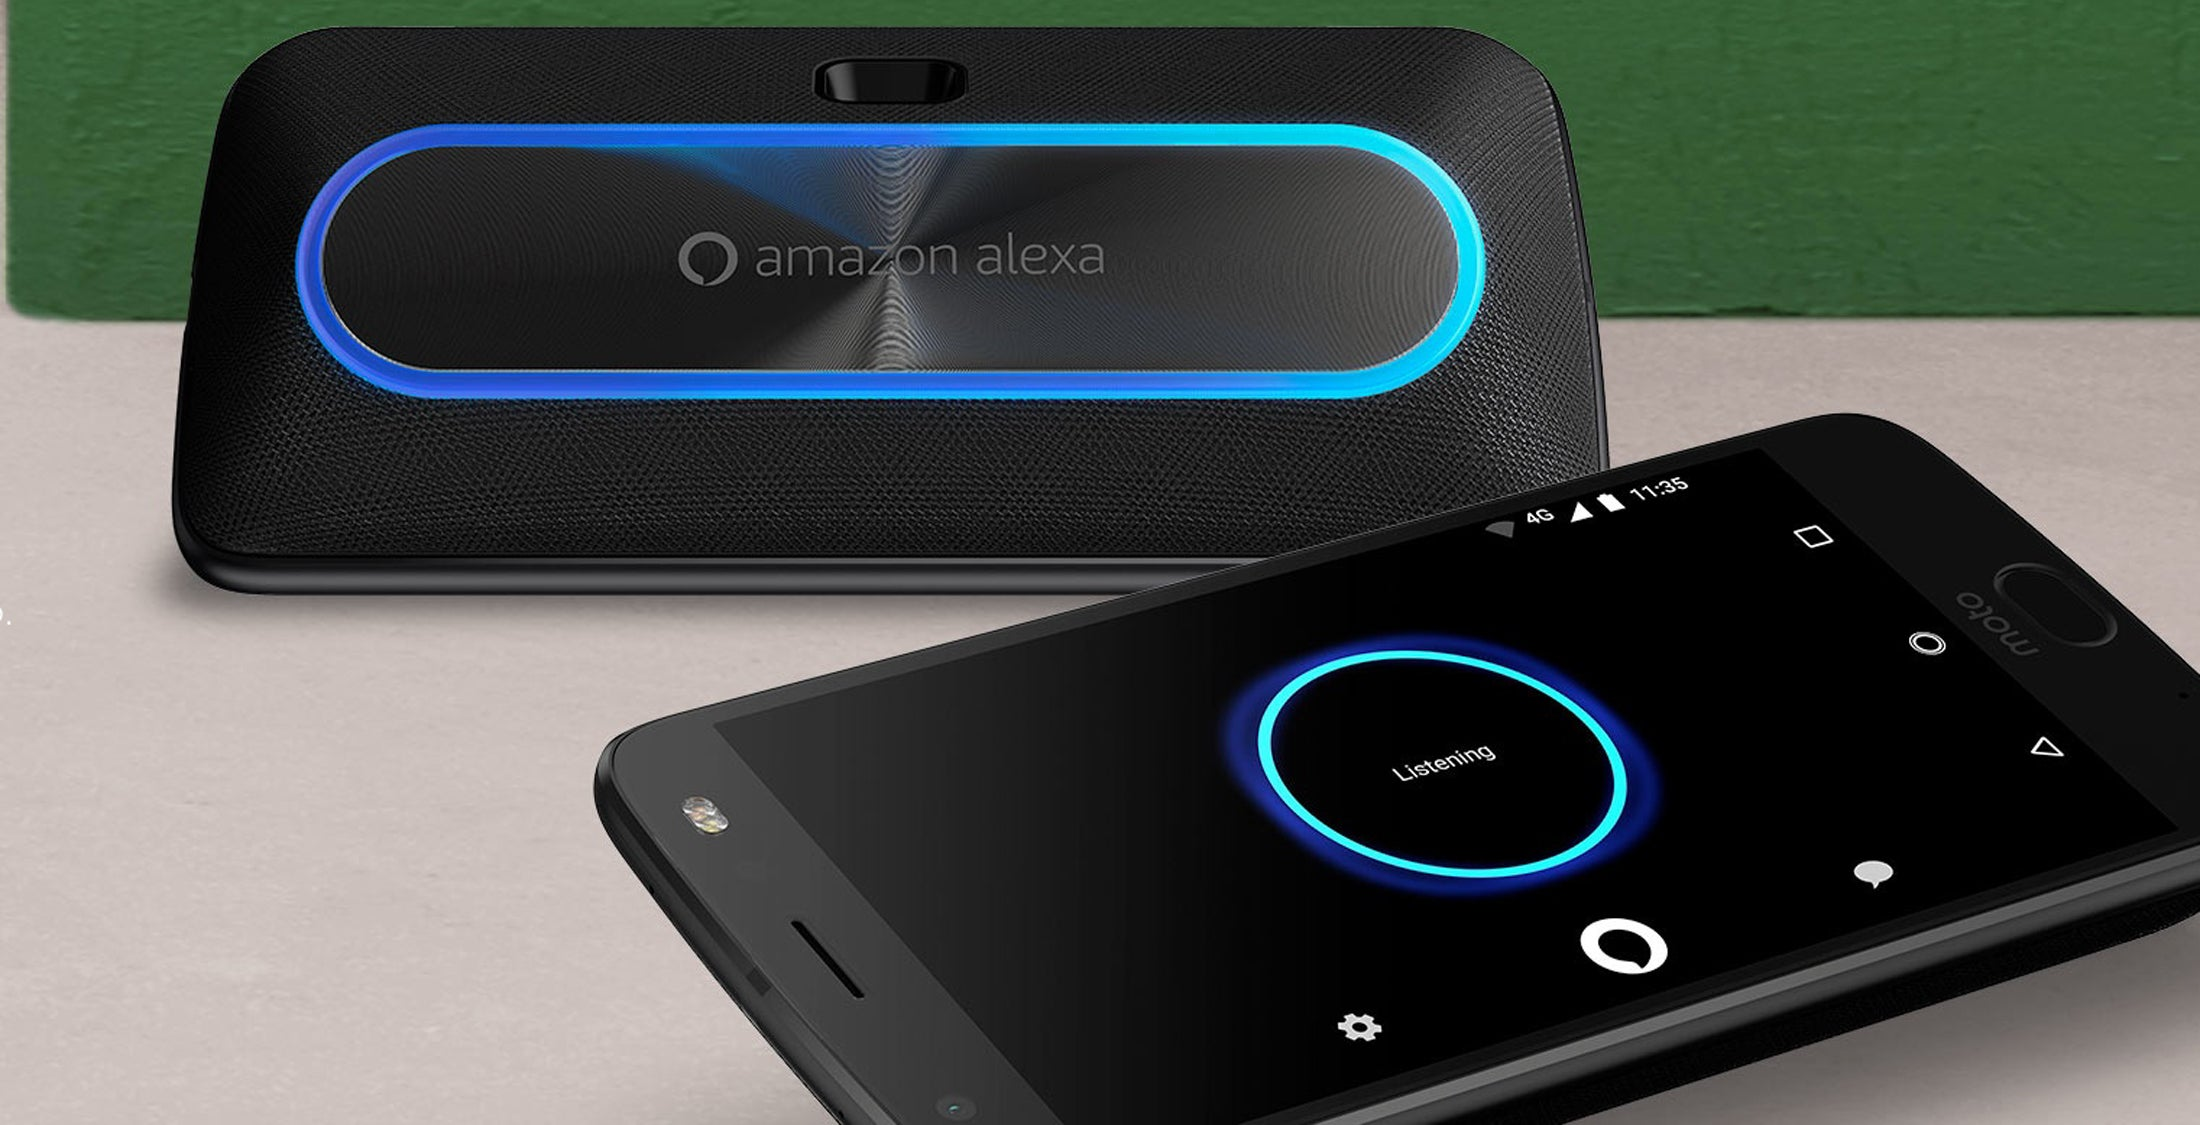 The Inevitable Marriage Of Moto Mods And Amazon Alexa Is